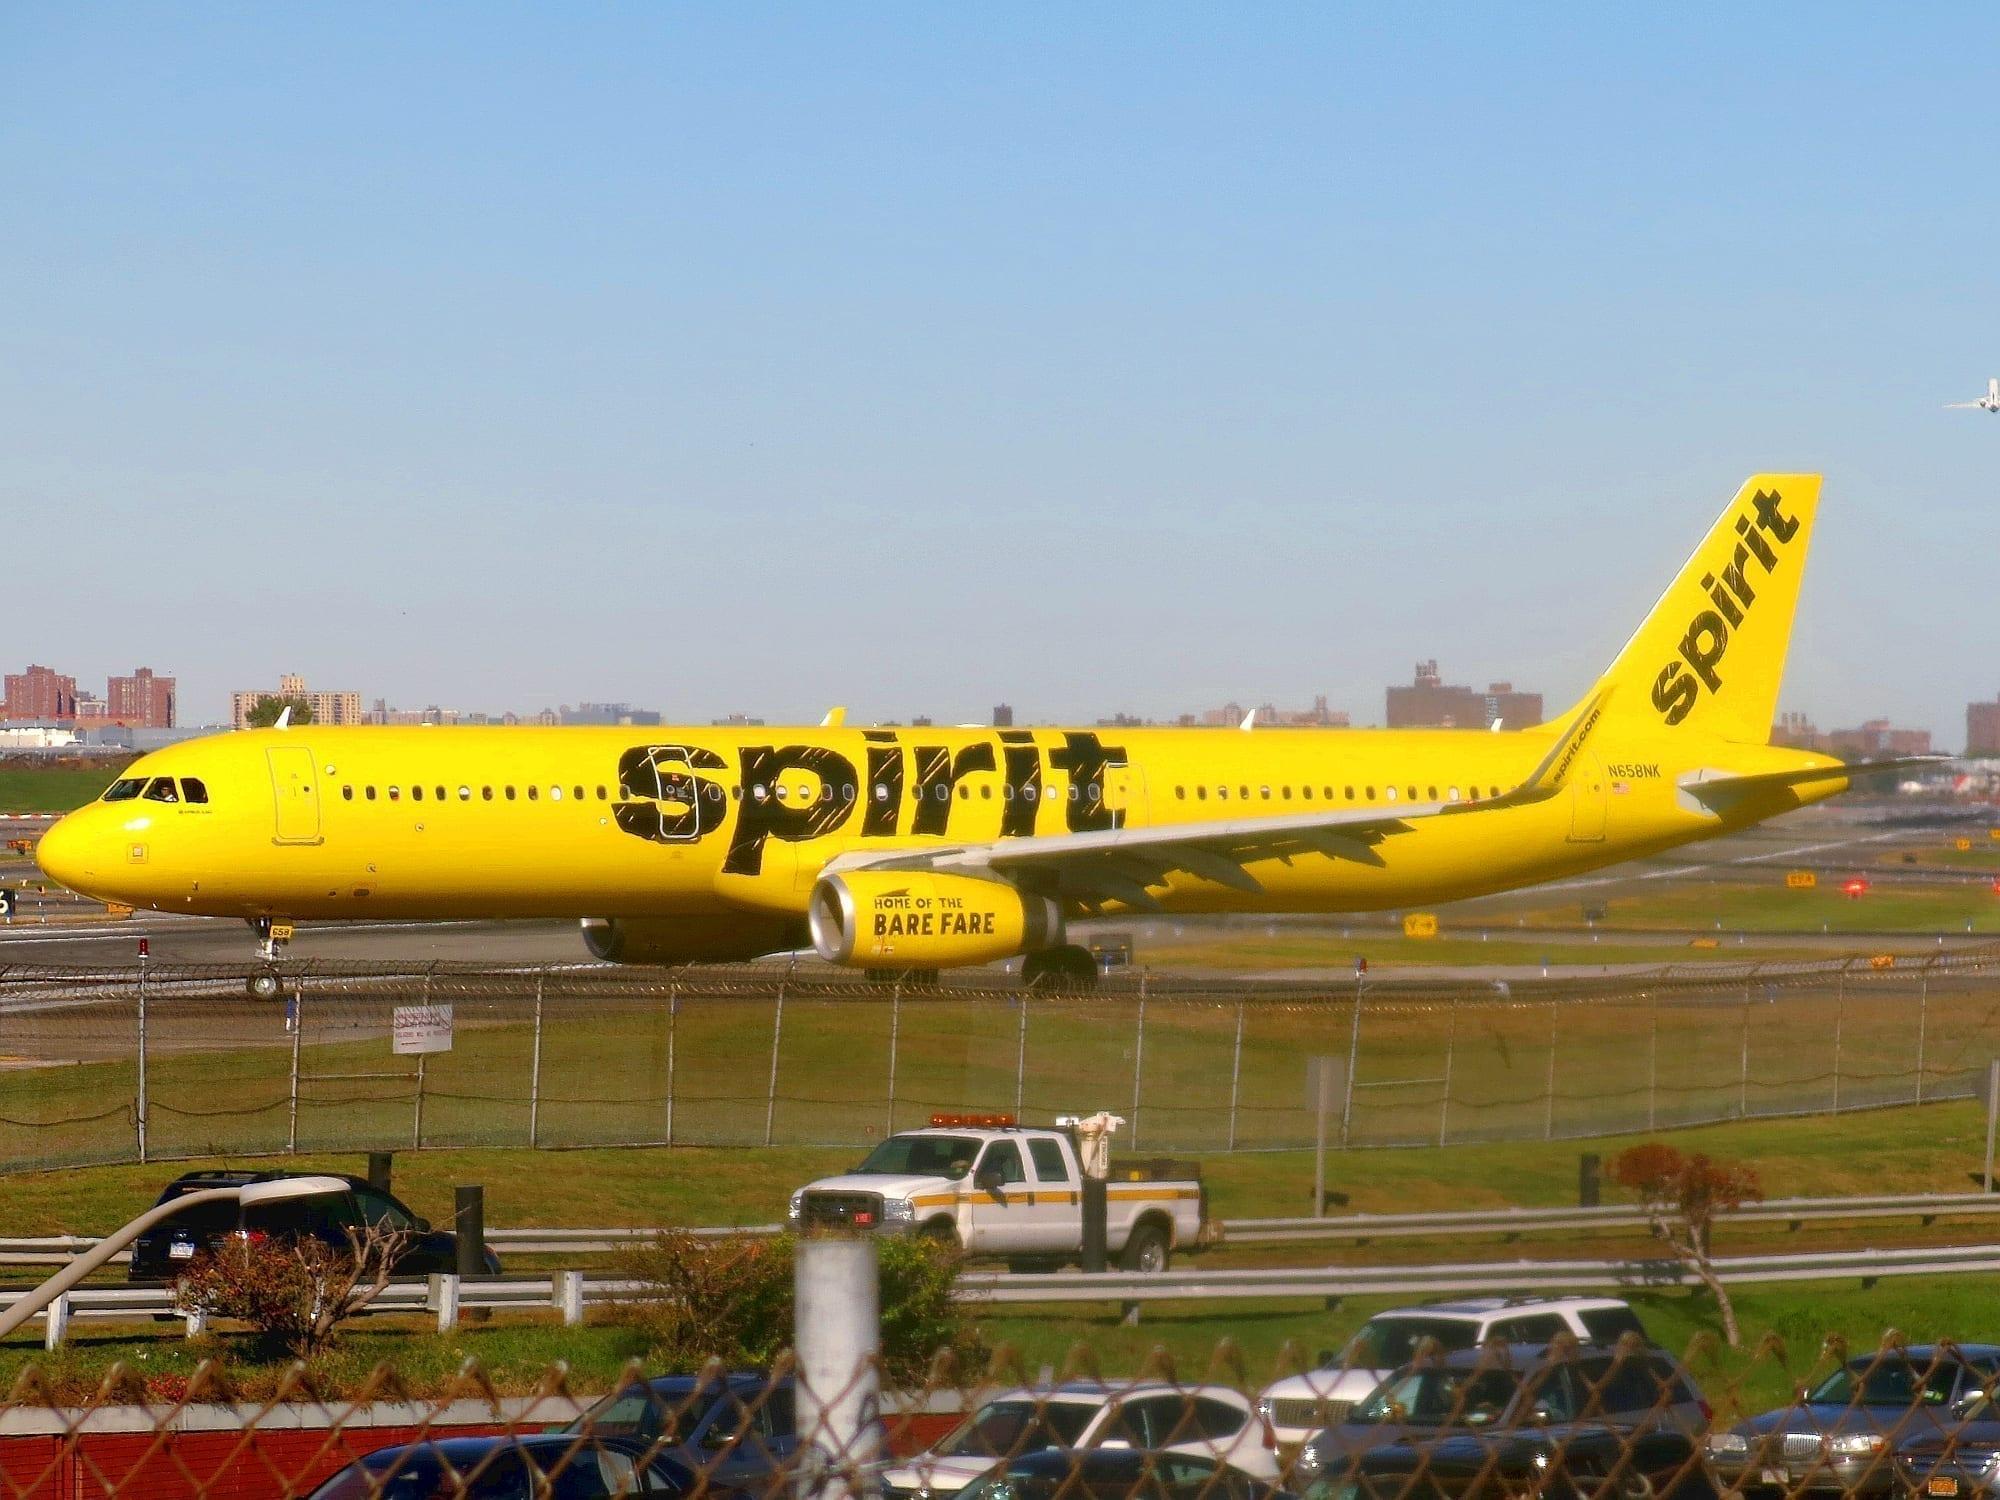 spirit airlines airbus a321 231(wl) n658nk